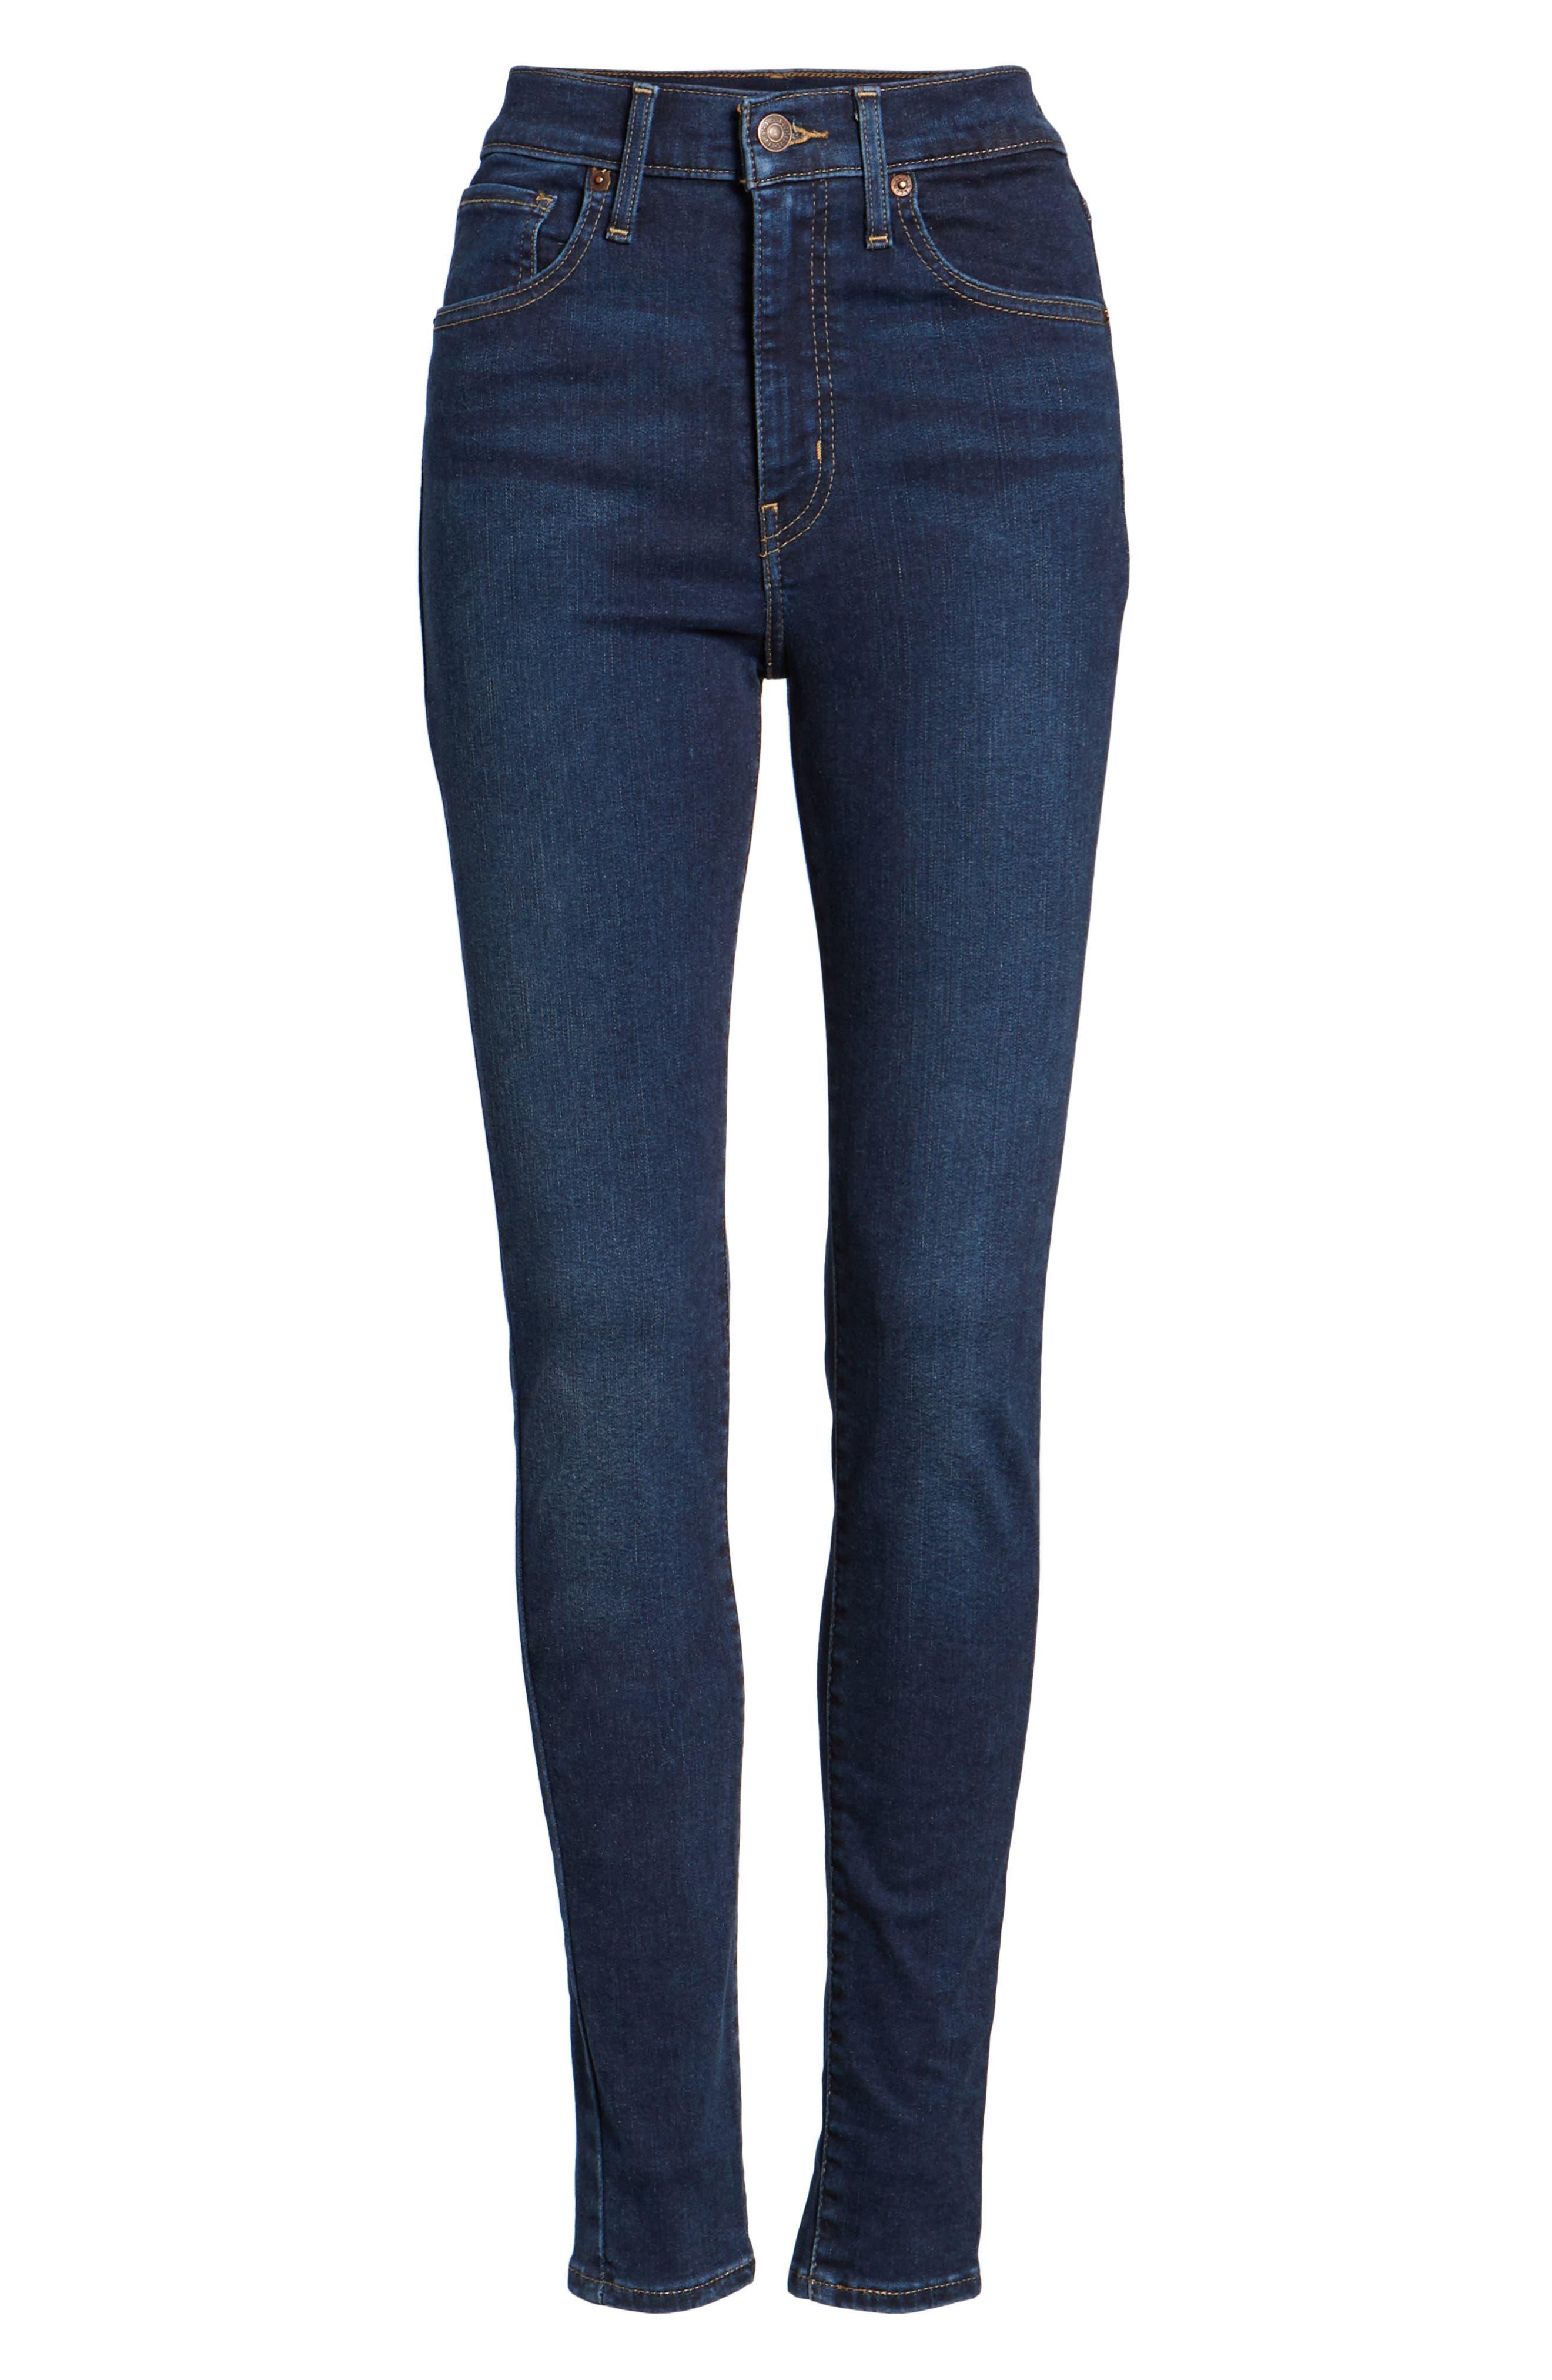 Mile High Super Skinny Jeans,                             Alternate thumbnail 7, color,                             JET SETTER